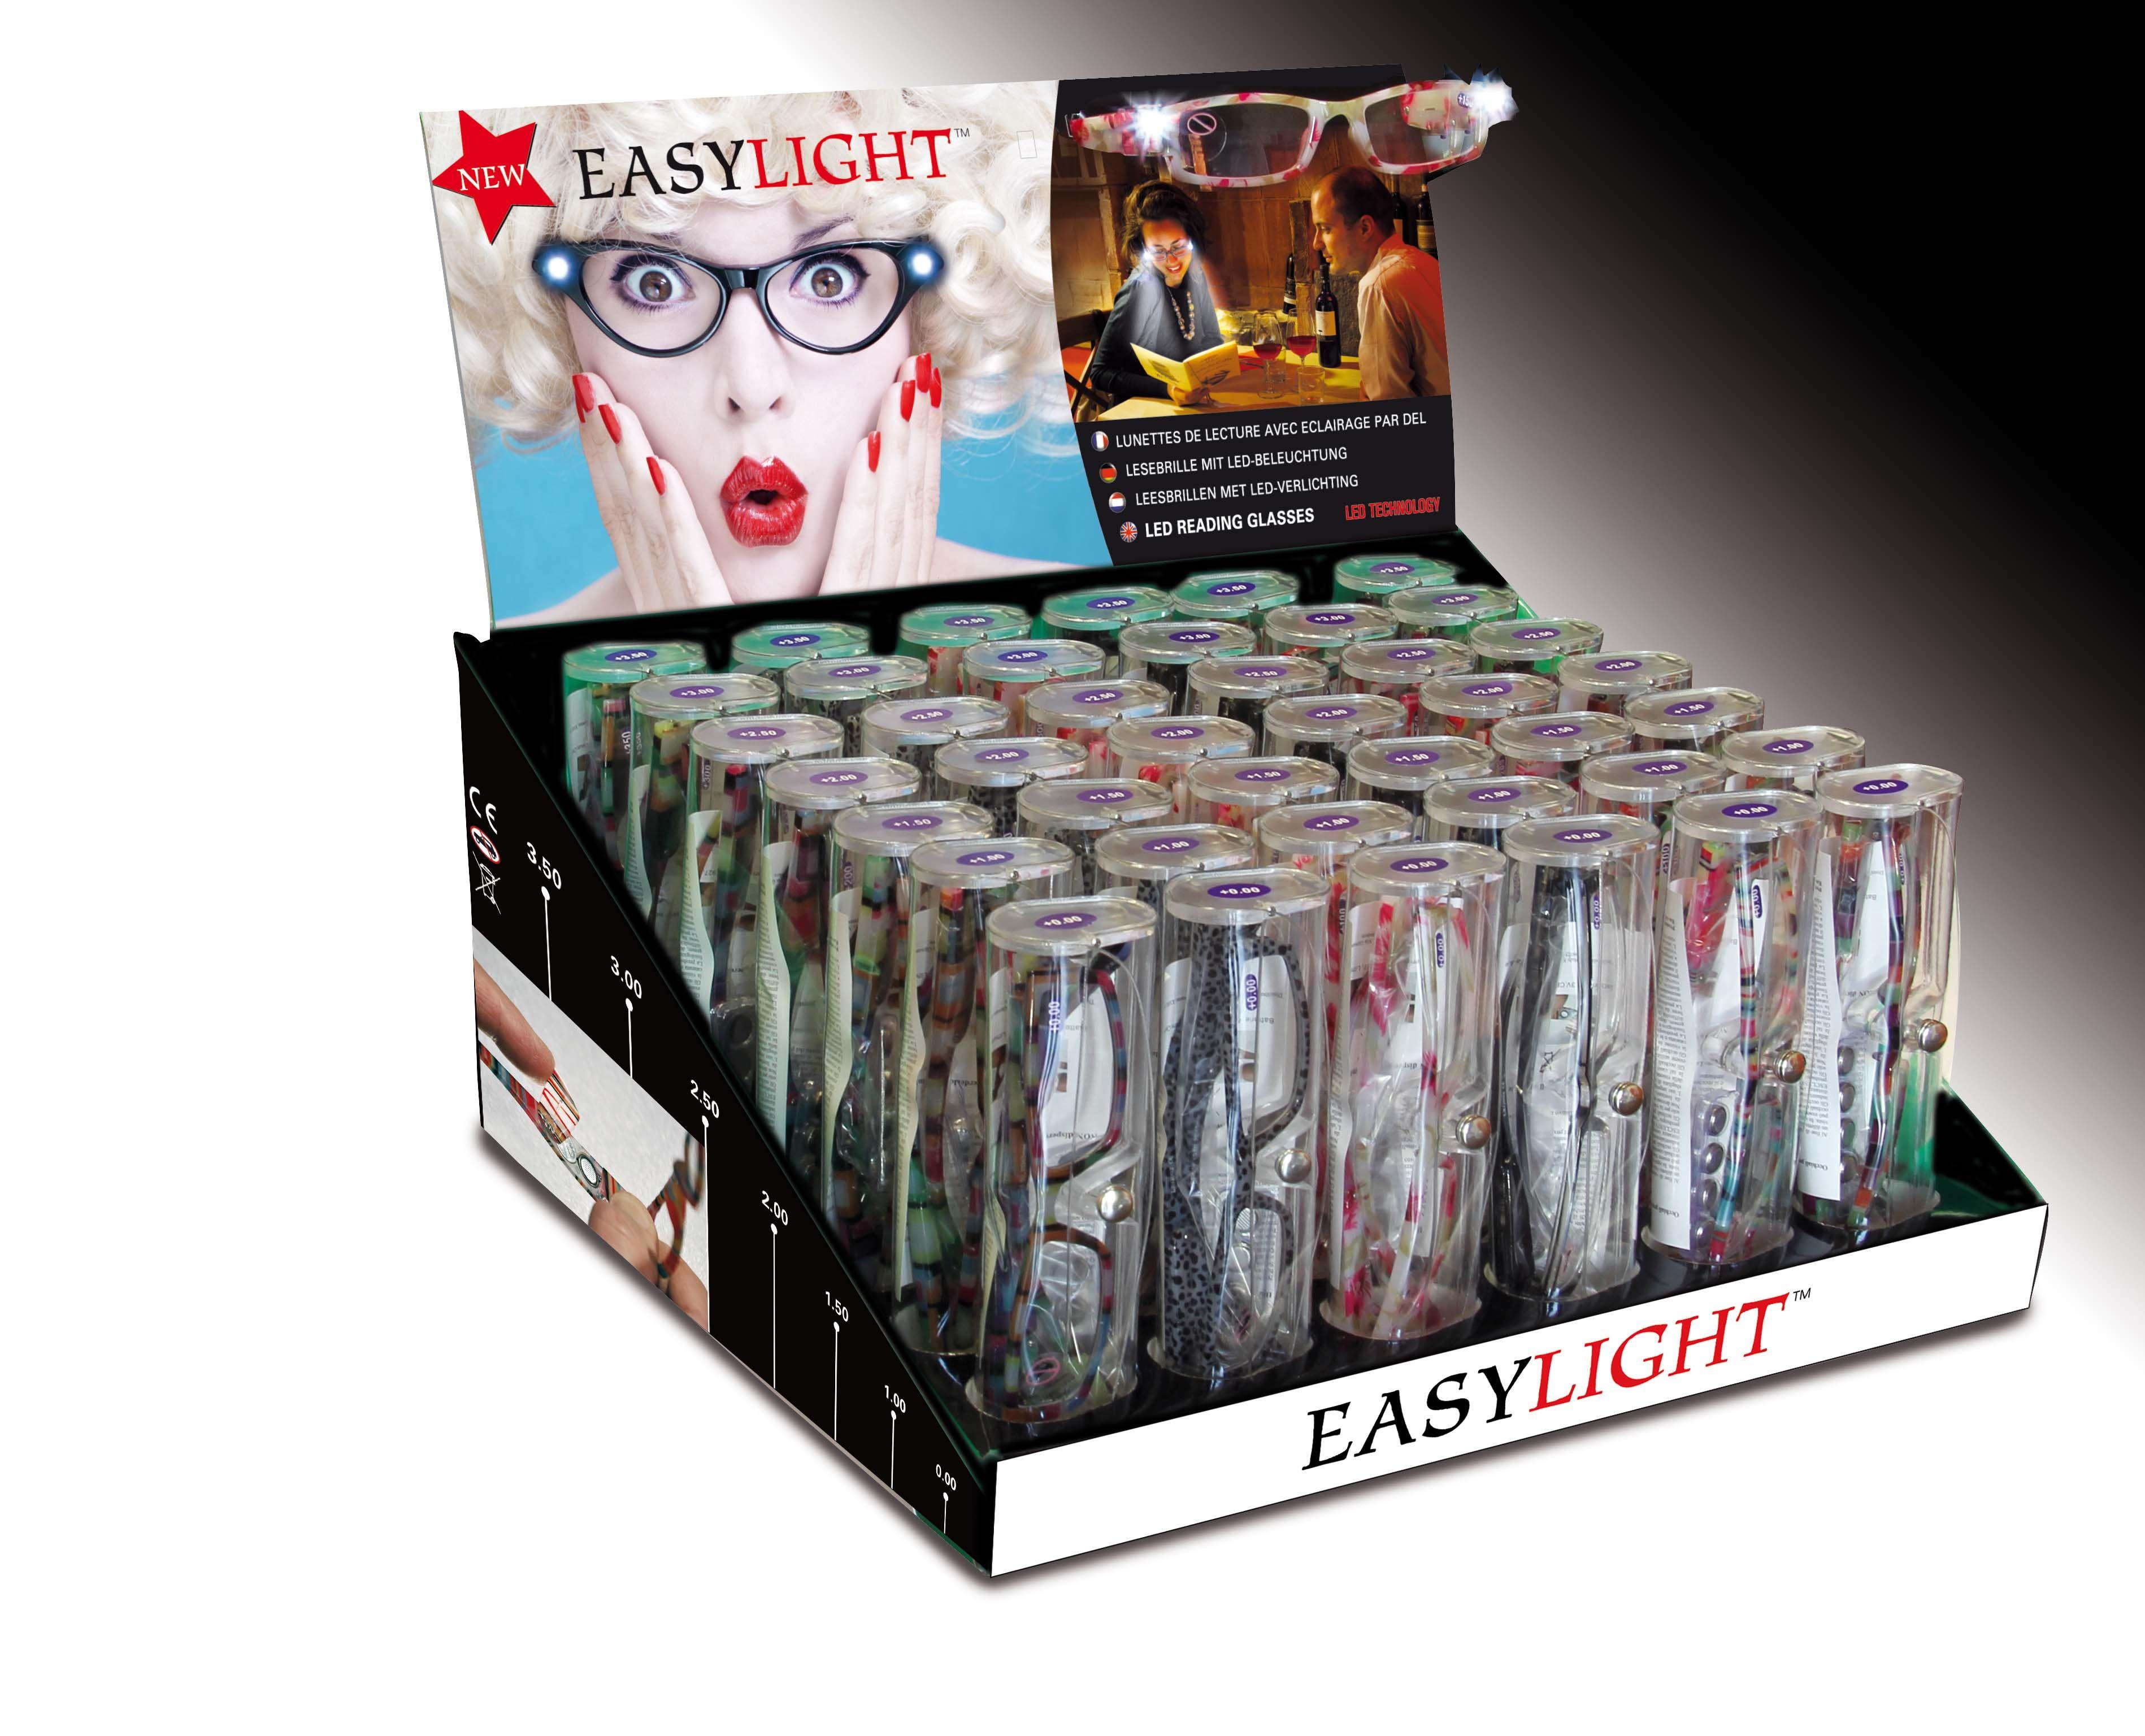 bf1bddd8e5f EasyLight LED Lighted Readers. Illuminated reading glasses